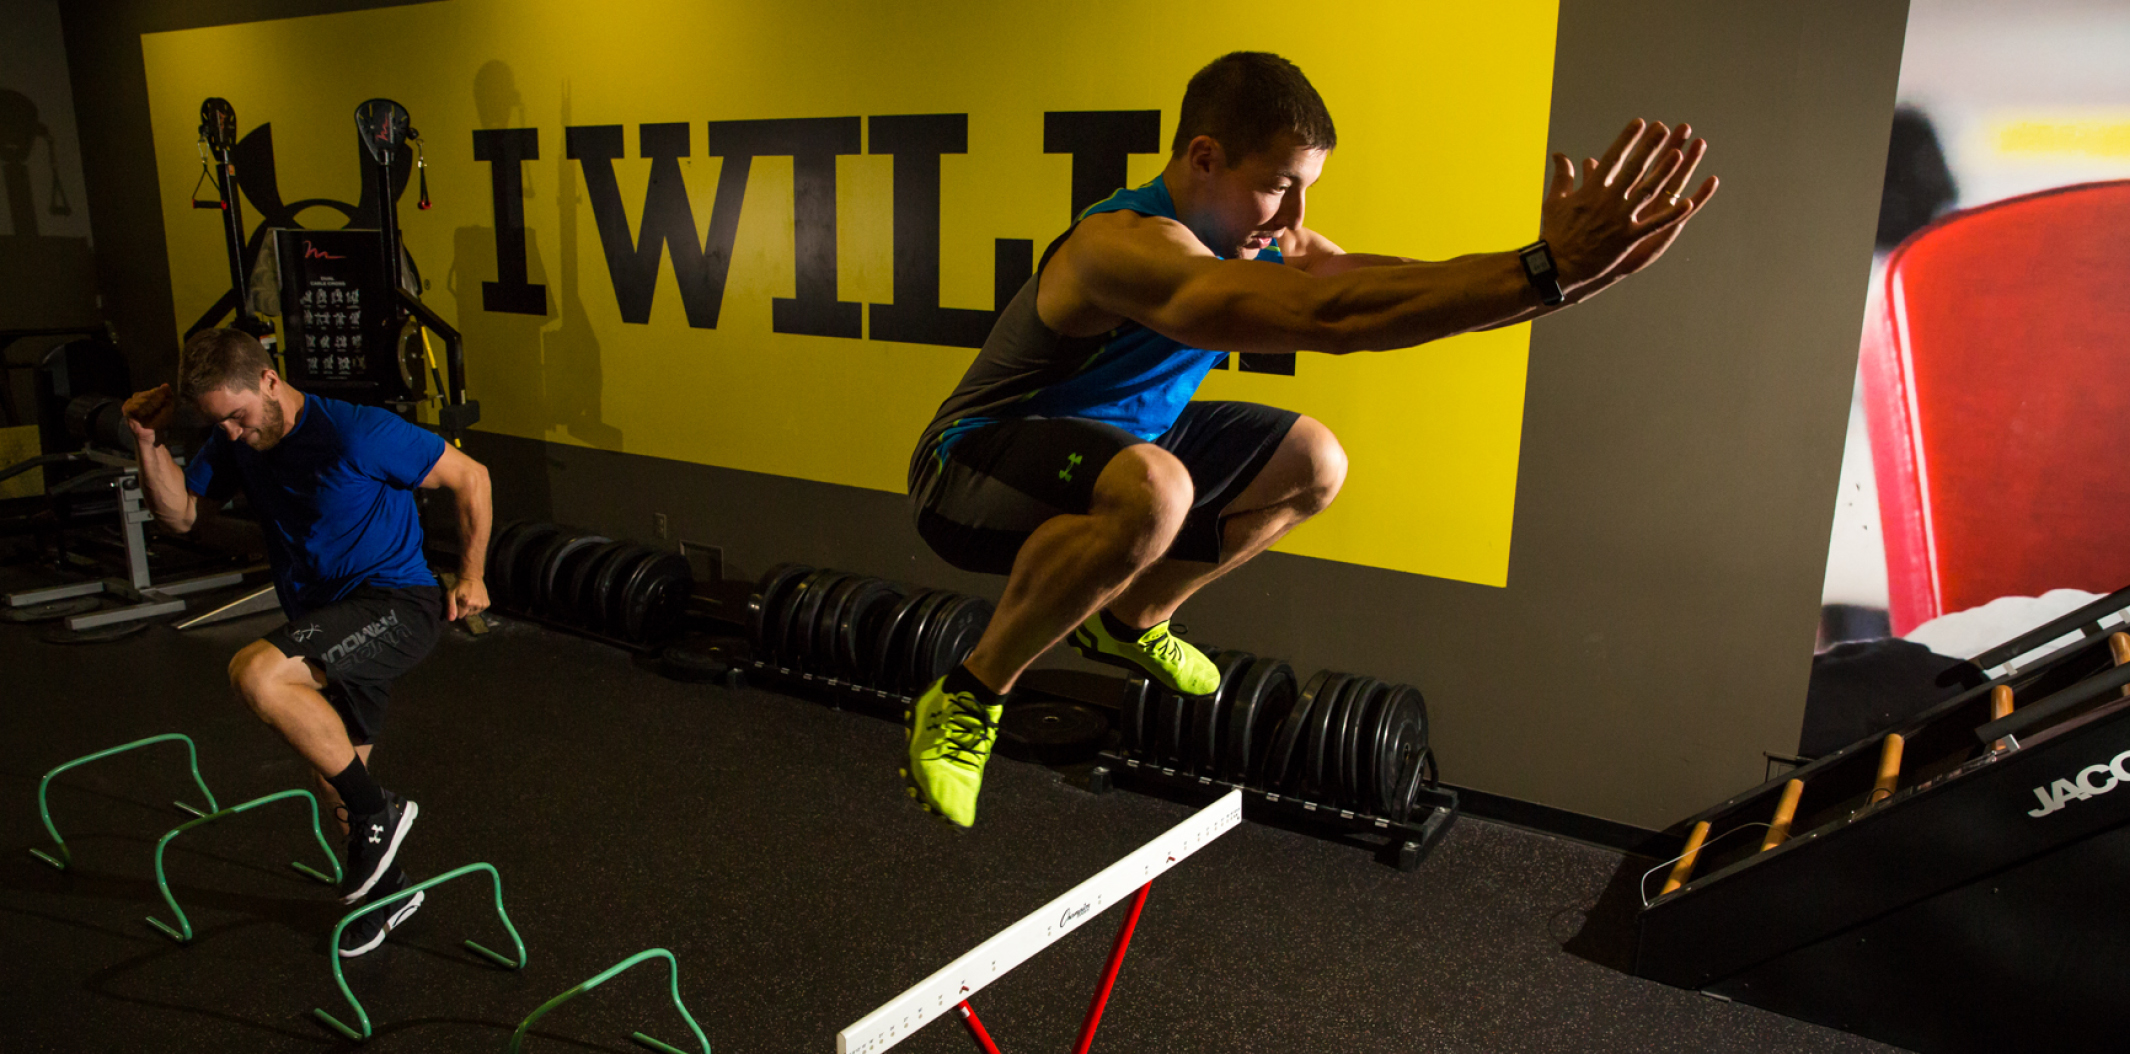 Boutique en ligne venta profesional revisa Under Armour Performance Center powered by FX Fitness